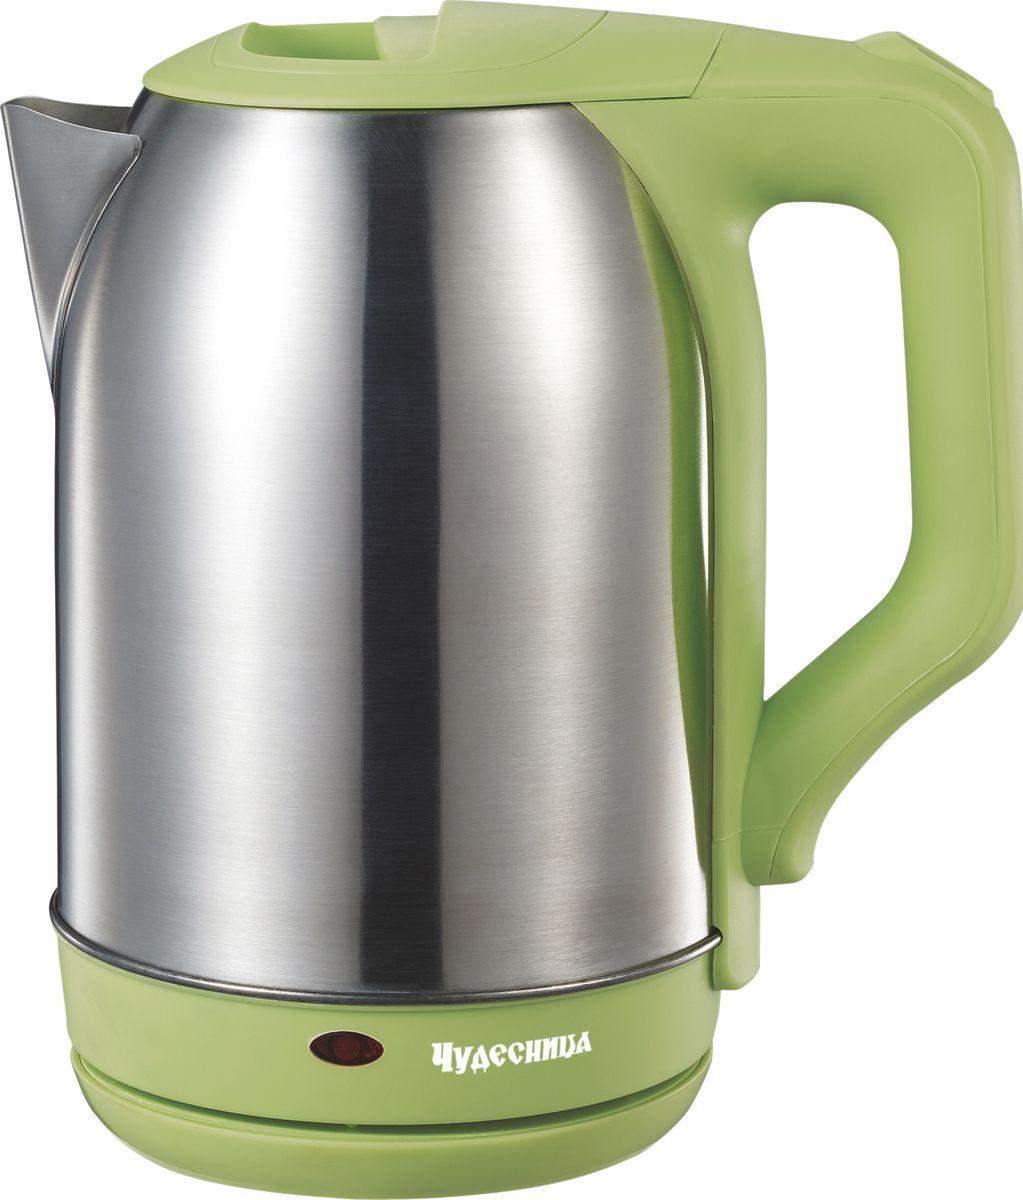 Чудесница ЭЧ-2021, Green чайник электрический чайник чудесница эч 2004 brown